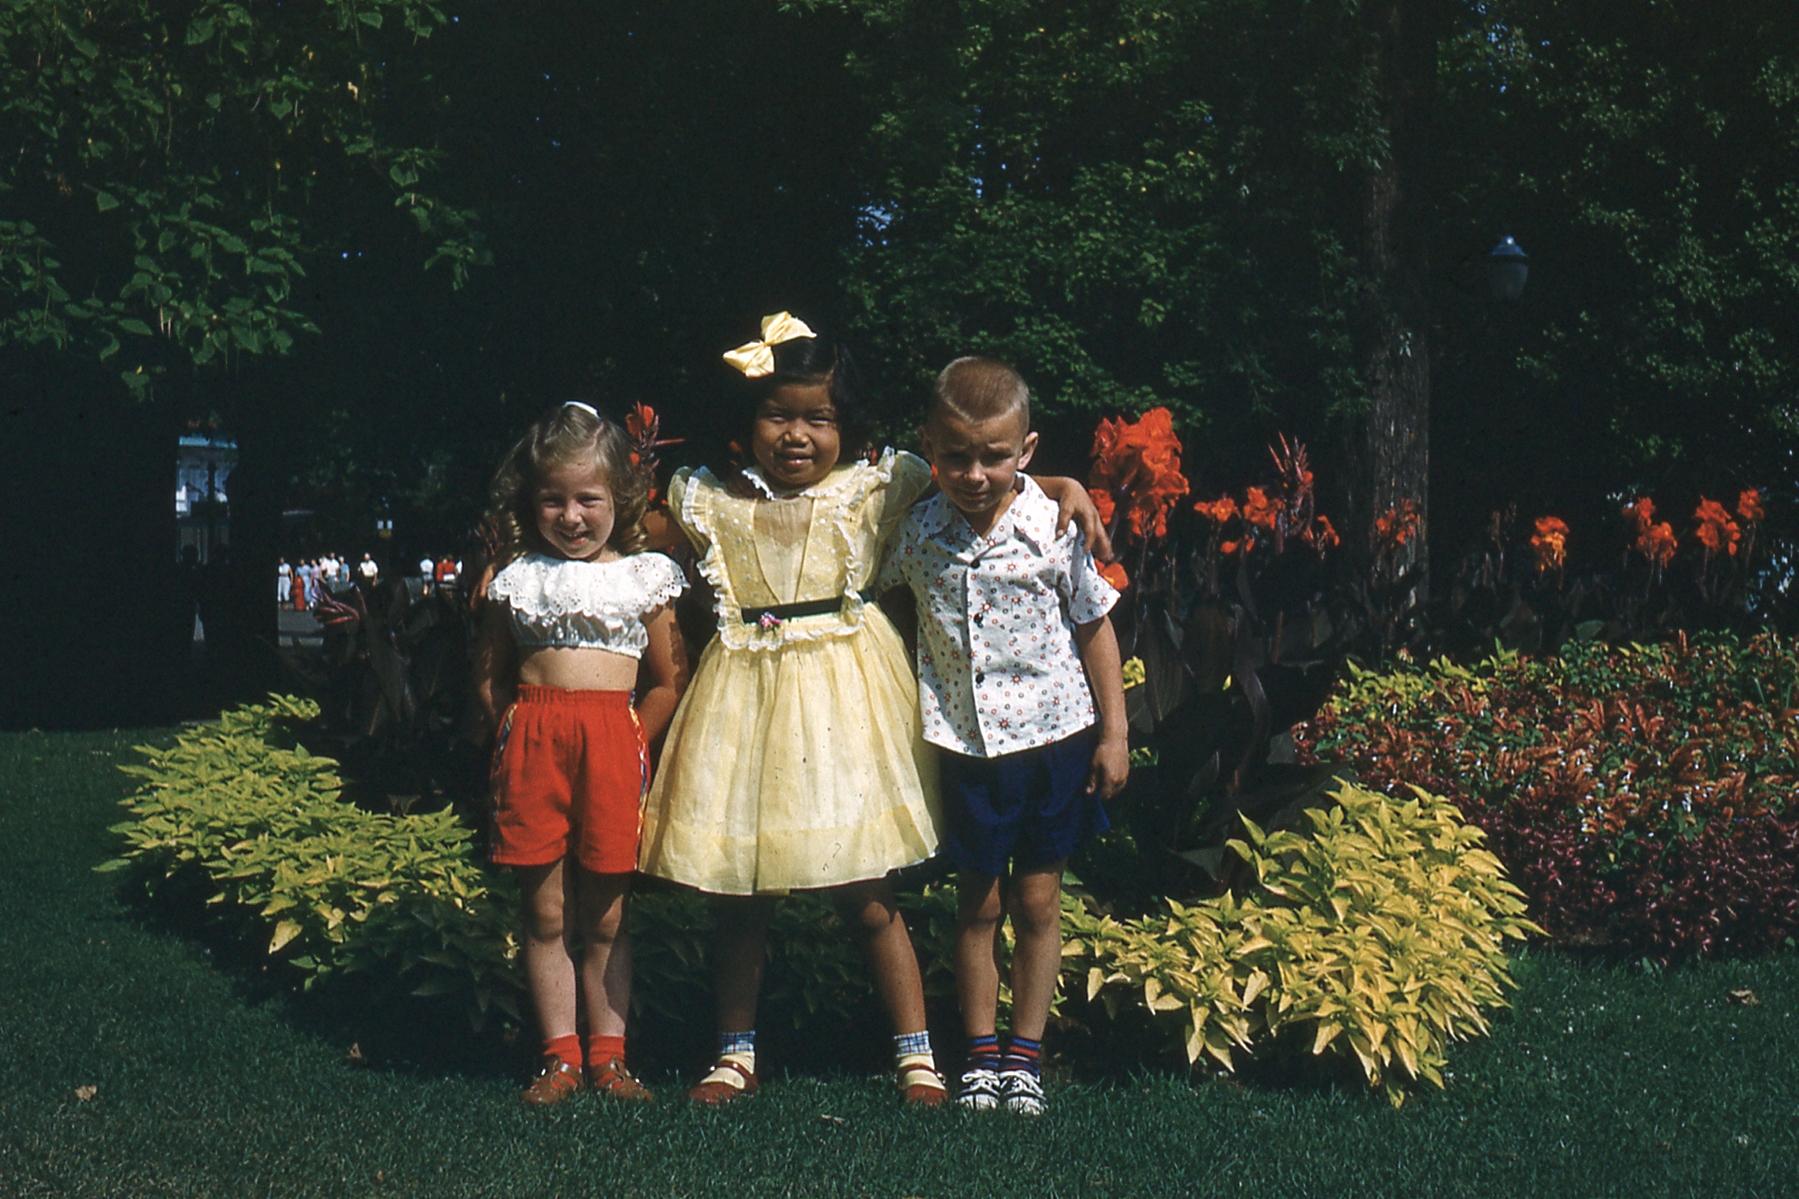 Barbara Light, cousin Kathy Zellers, and me circa 1954